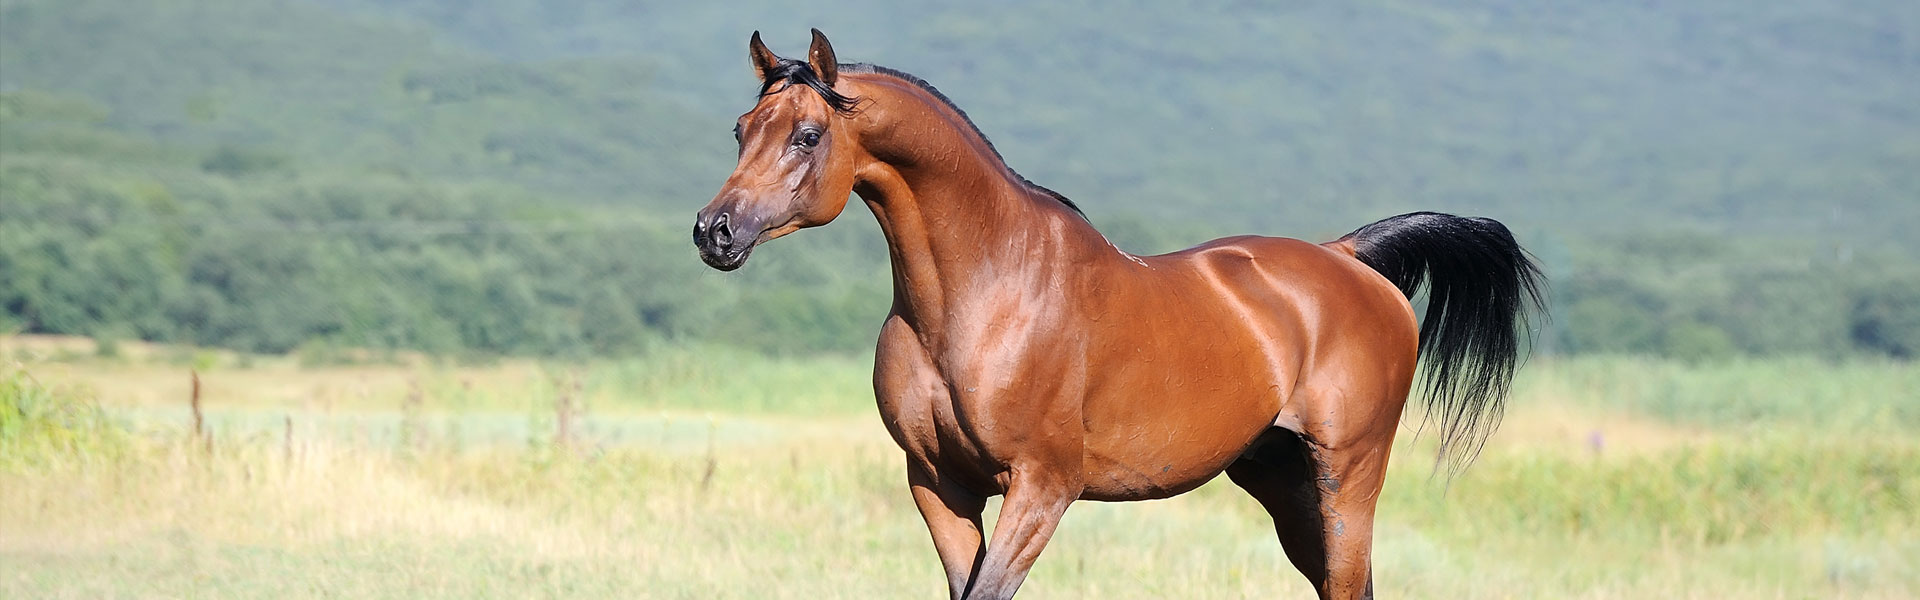 Paardfit.nl